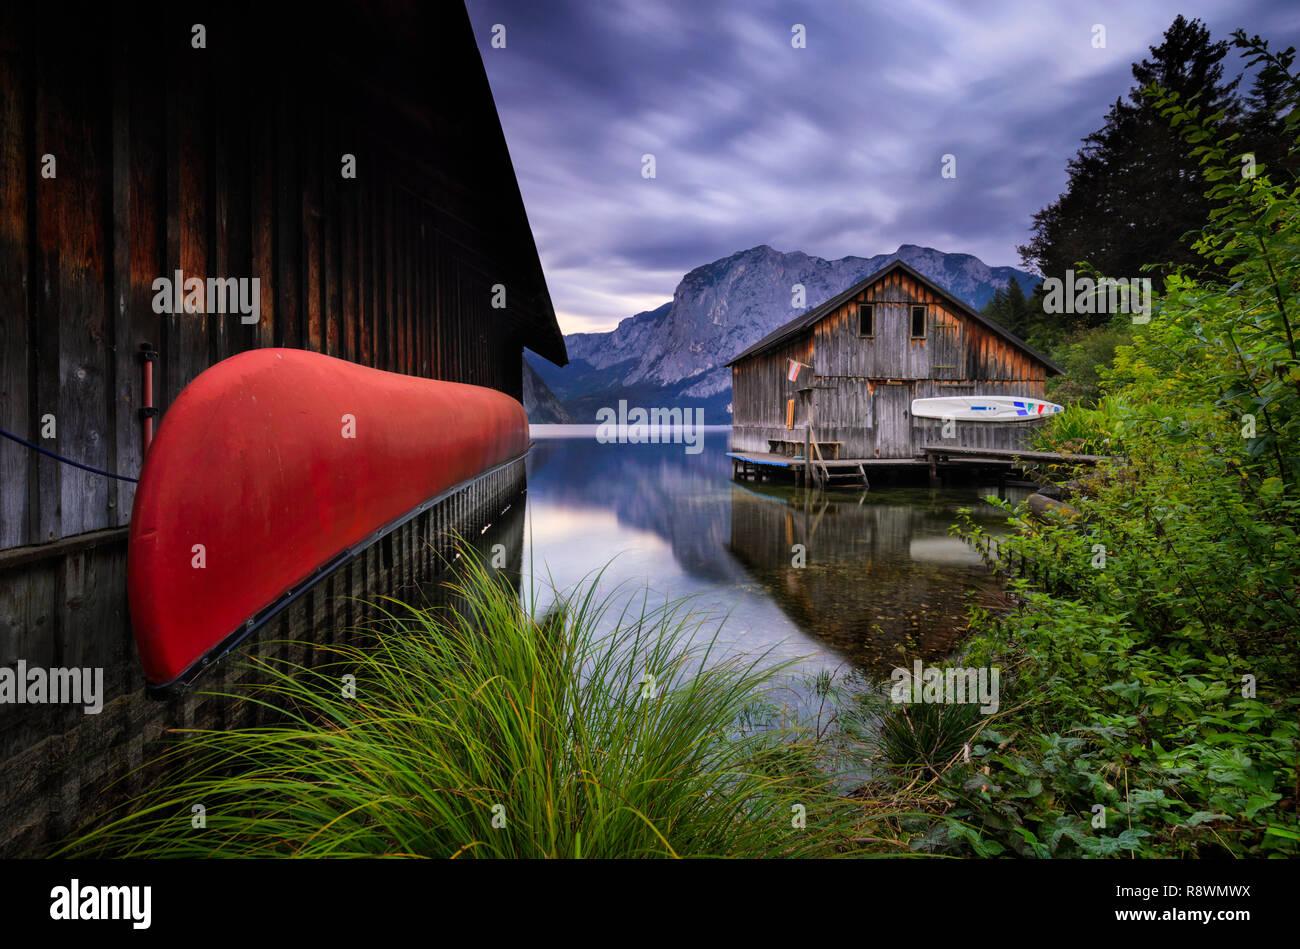 Altaussee Voile Remise, Autriche Photo Stock